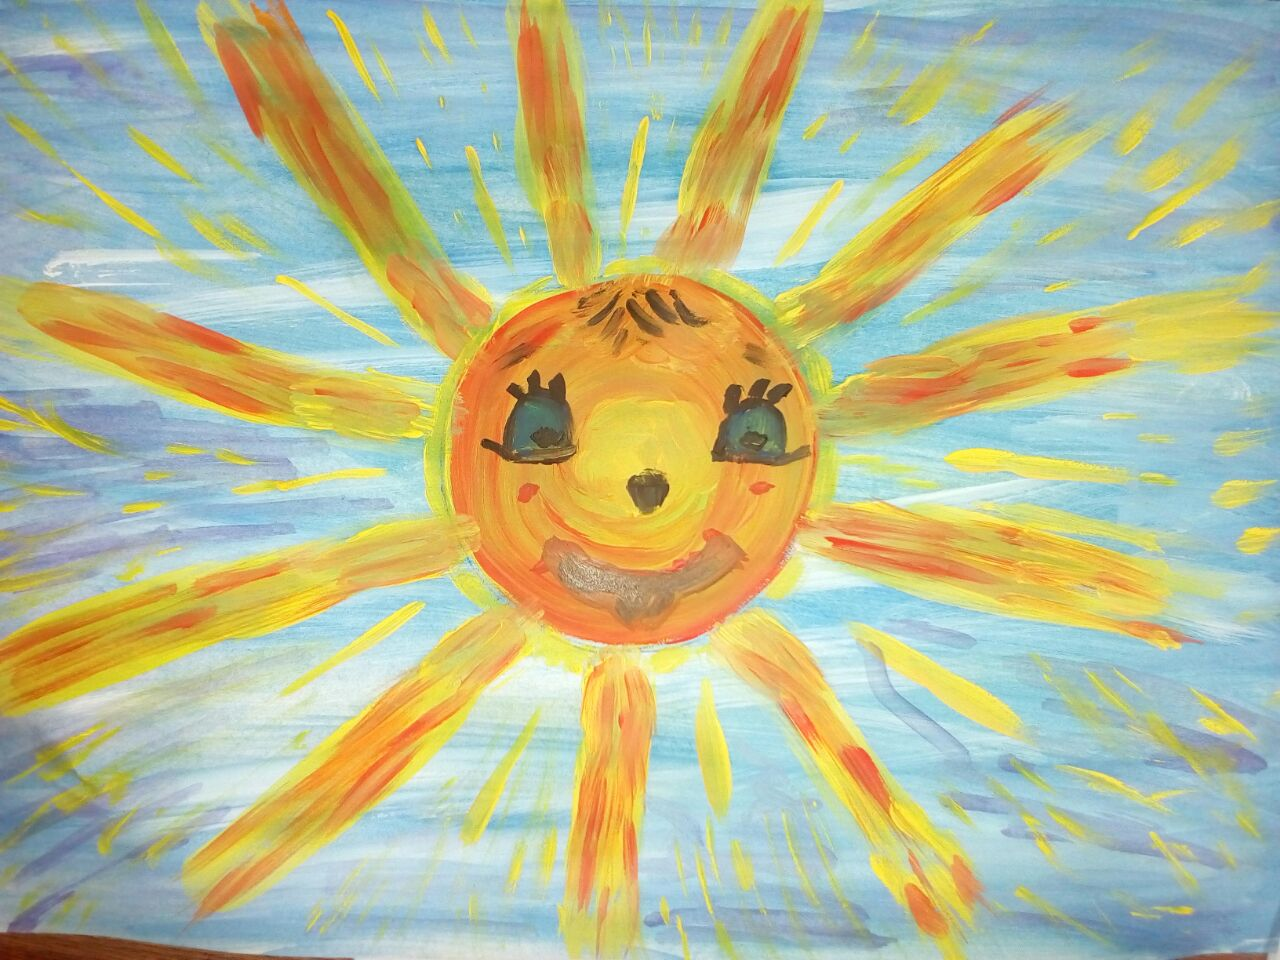 Солнышко рисуют дети картинки